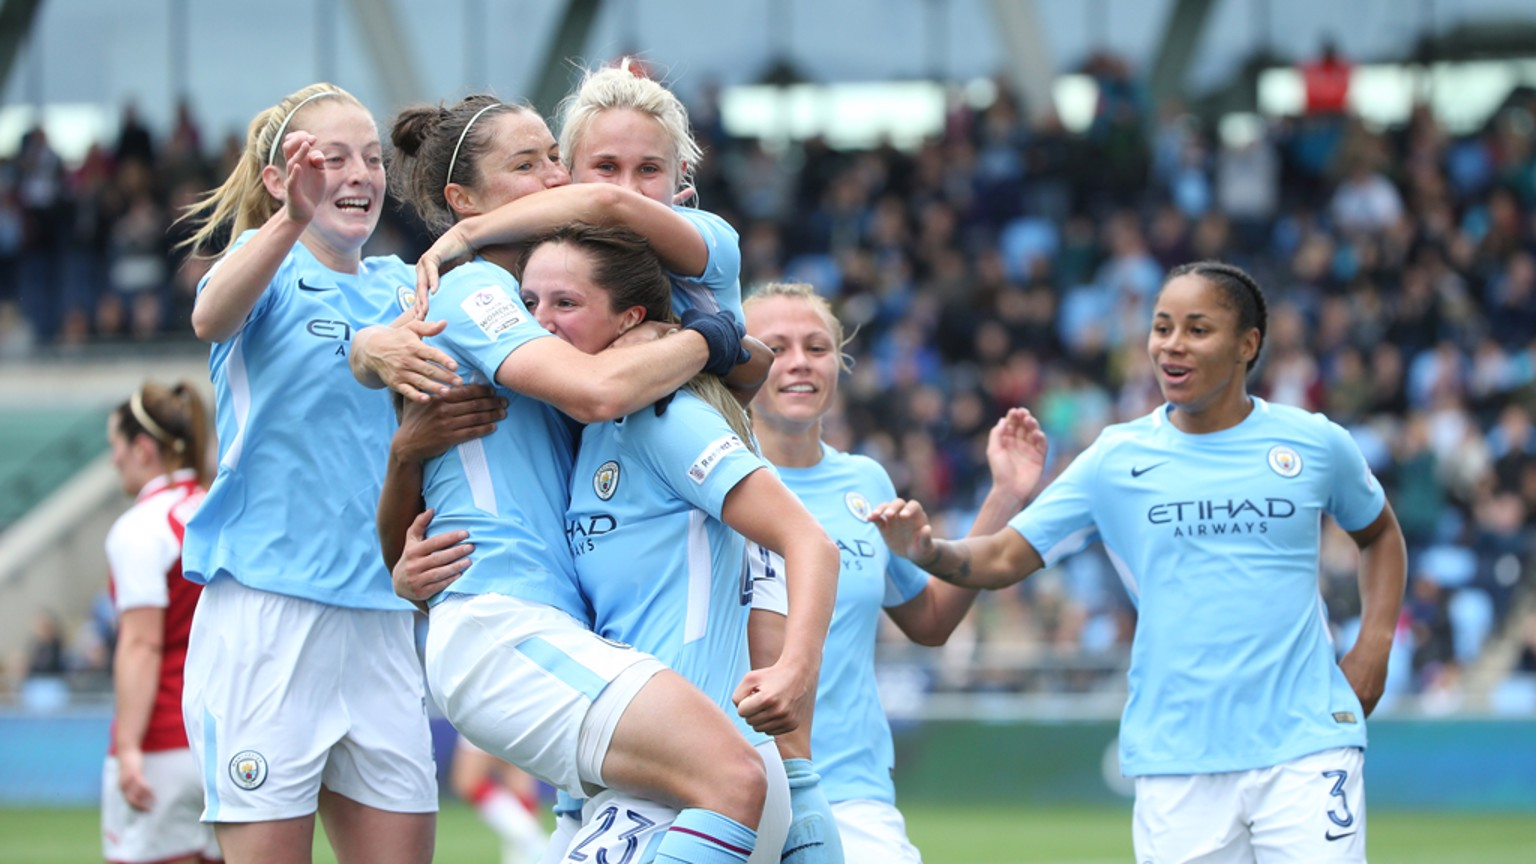 FIVE STAR CITY: The team celebrate Jane Ross' goal